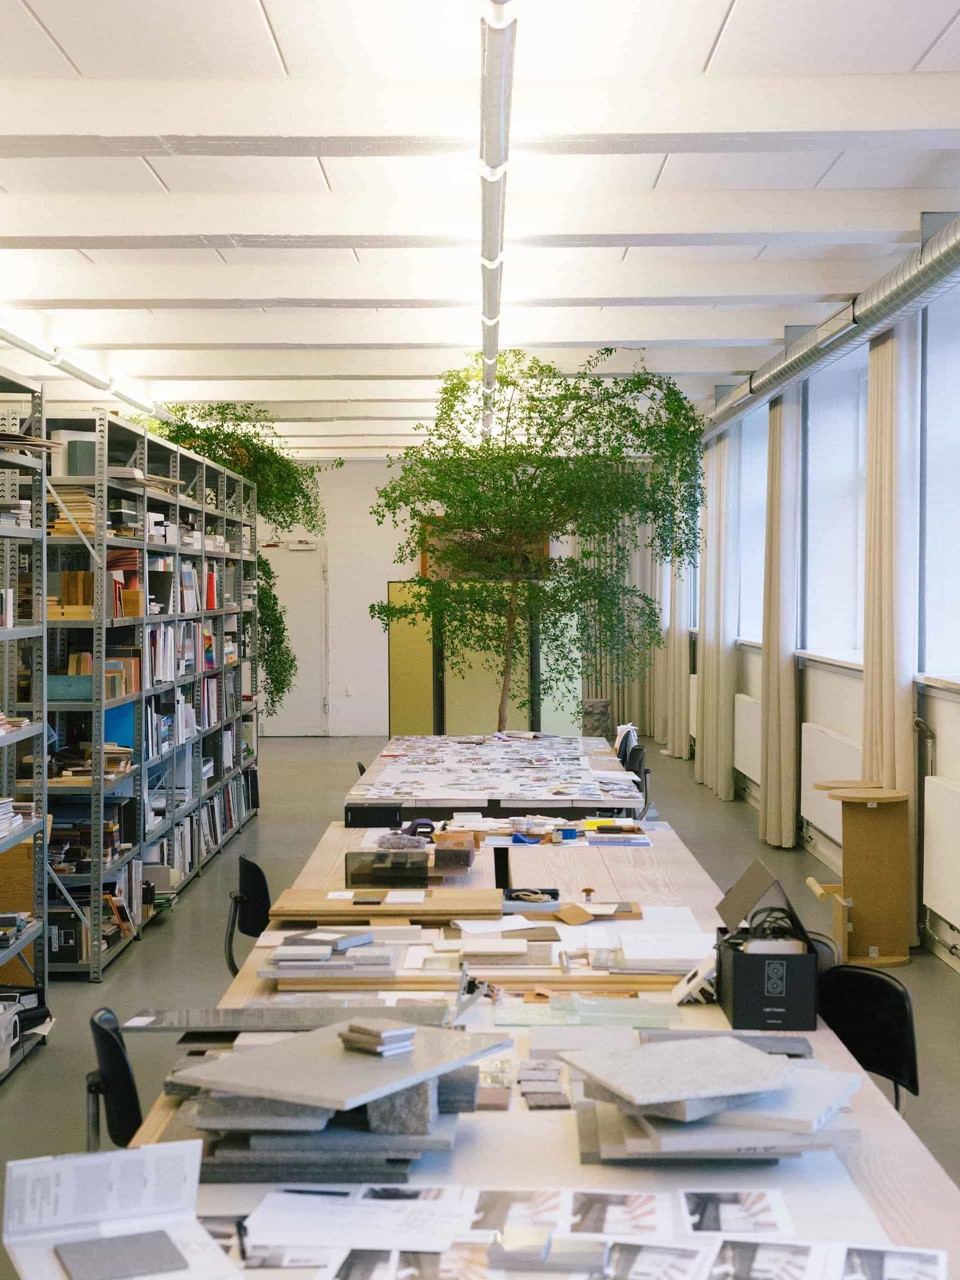 studio-david-thulstrup_workspace_play-it-forward_dinesen-ash.jpg